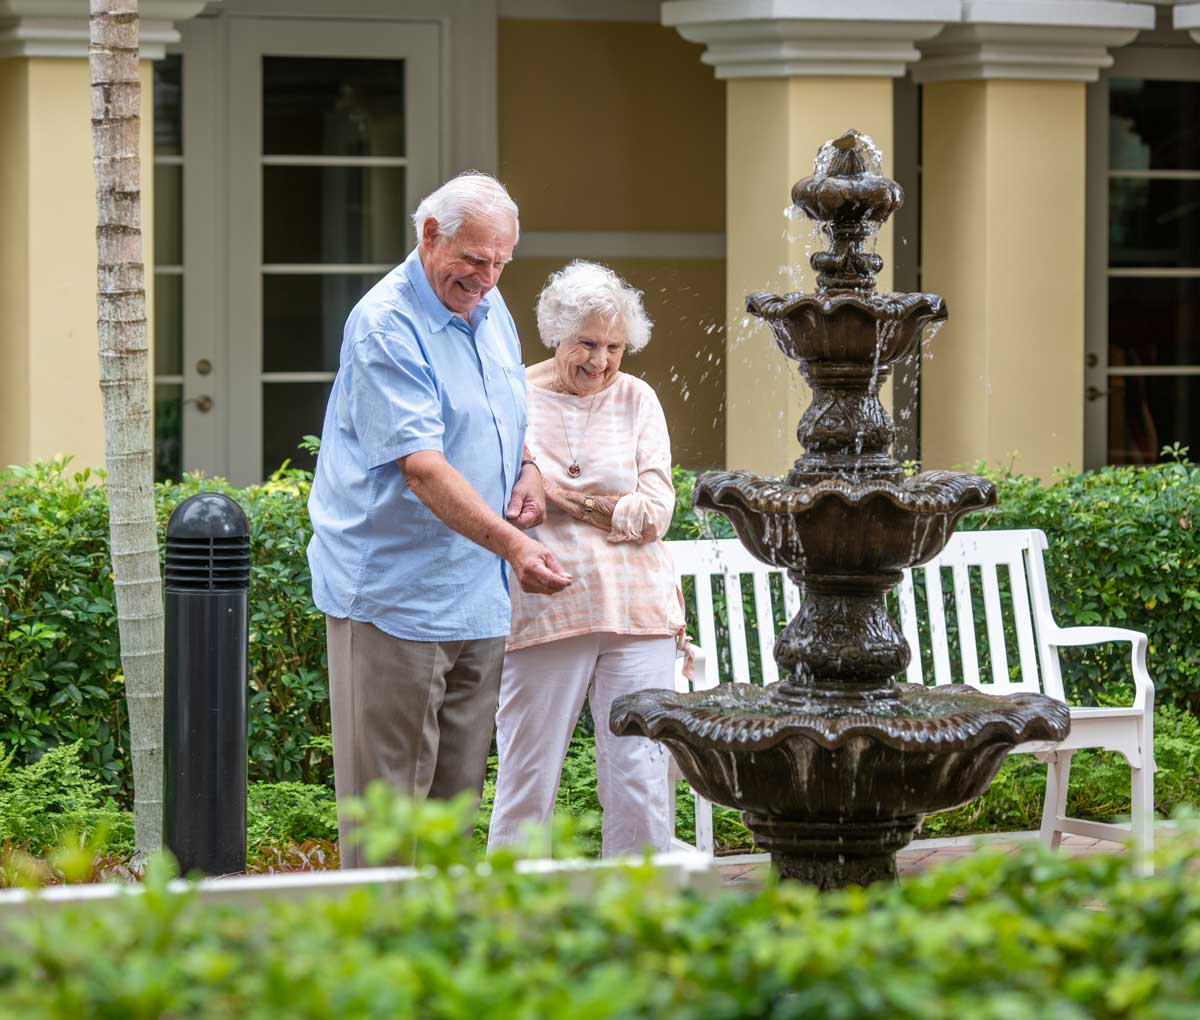 6 Ways Senior Living Improves Quality of Life for Seniors